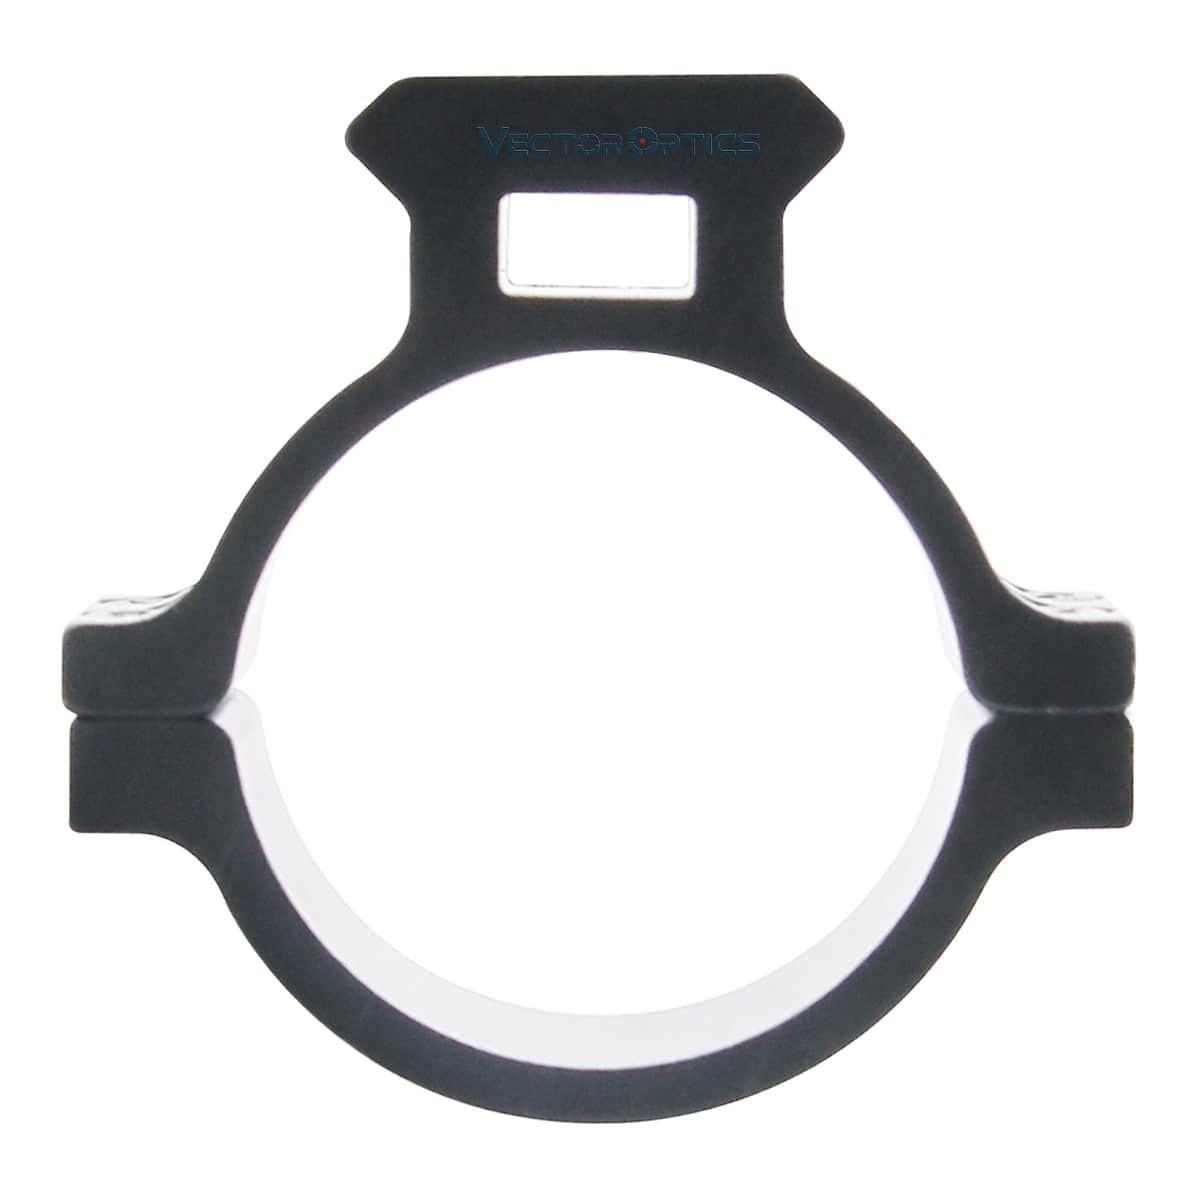 30mm Scope Mount Ring